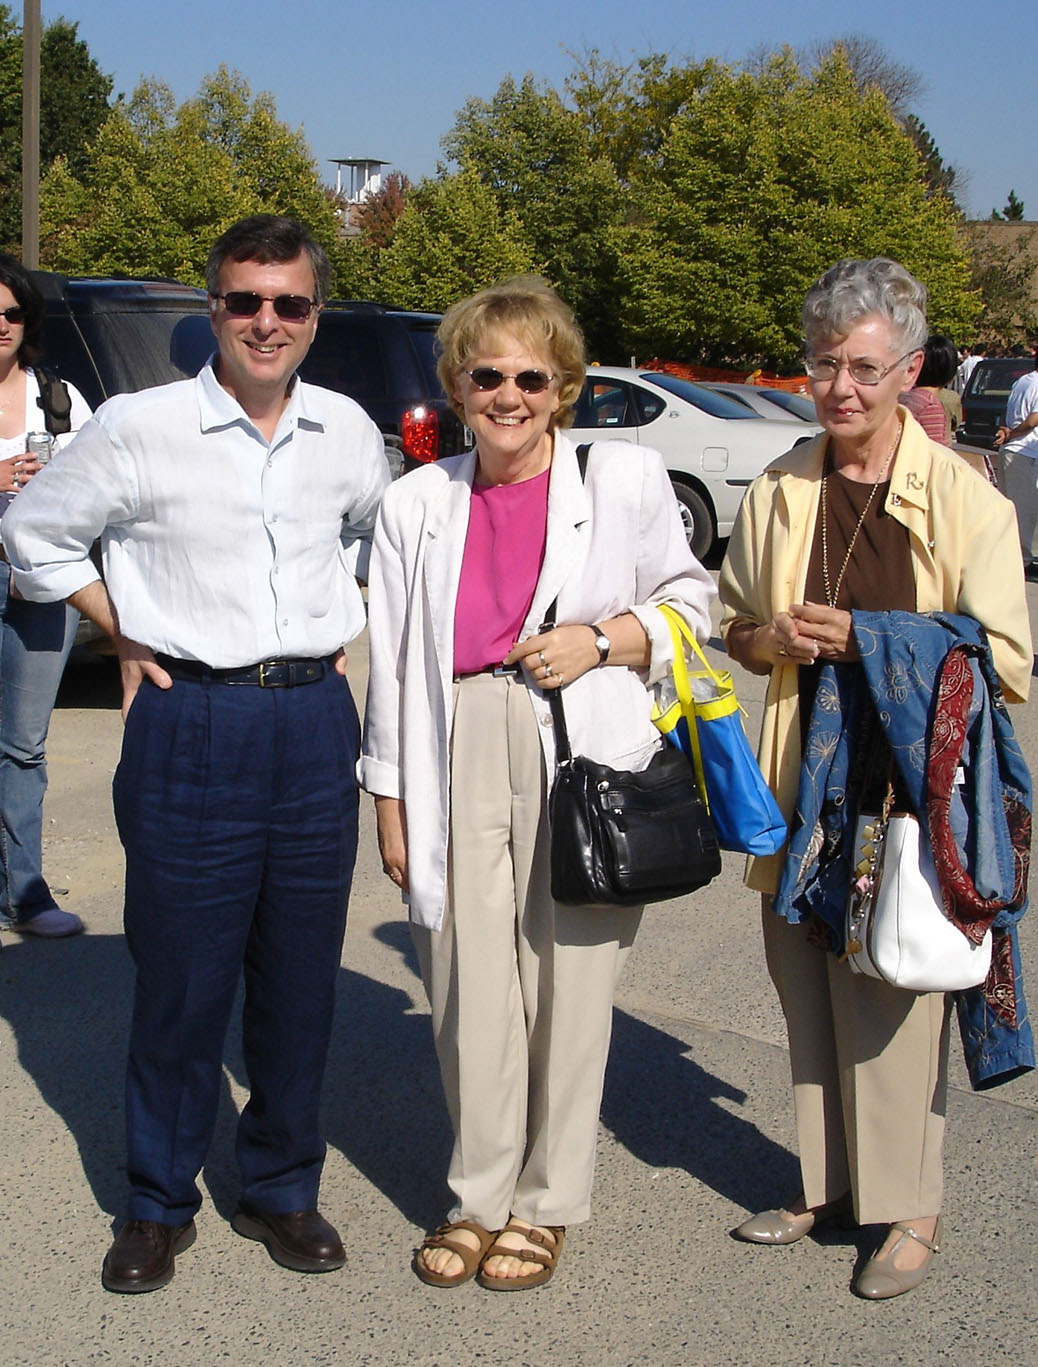 Nikolaos Katopodes, Linda Fink and Rita Teachout